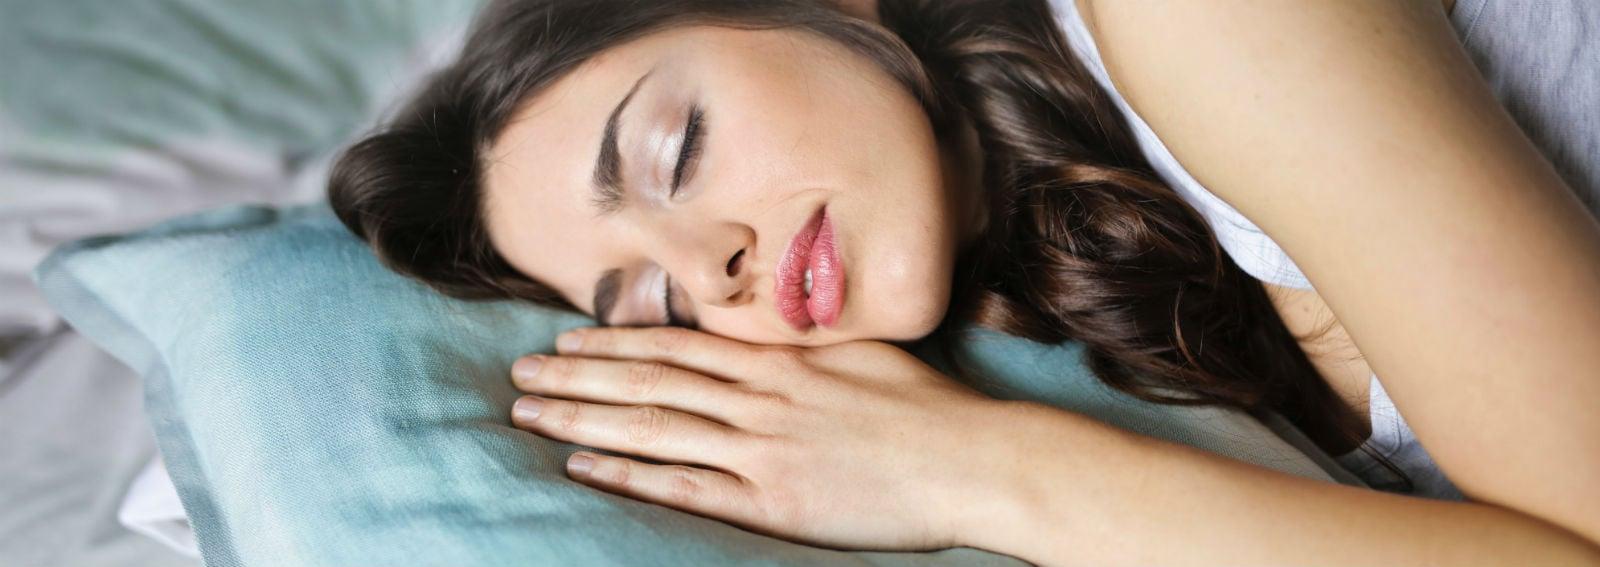 Donna sonno dormire (Cover desktop)